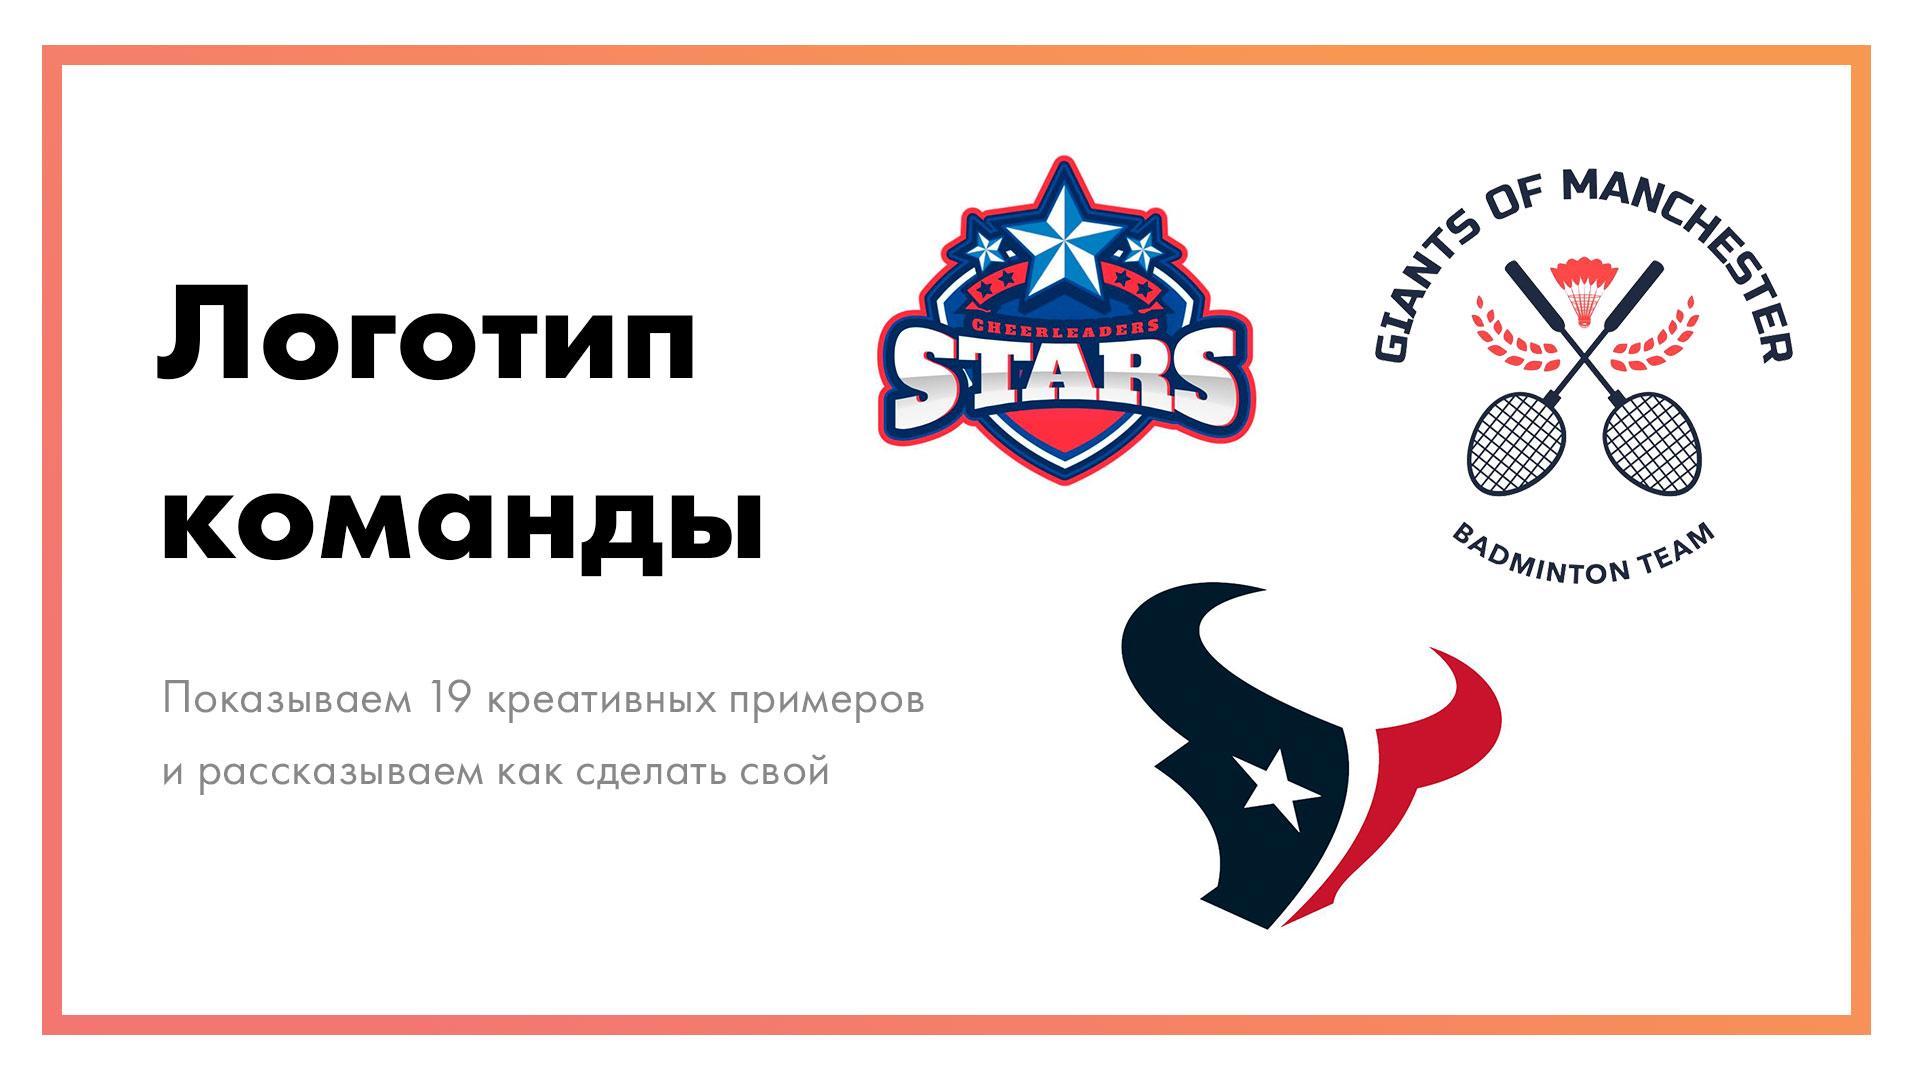 Логотип-команды---19-креативных-примеров-дизайна-[+-онлайн-сервис].jpg